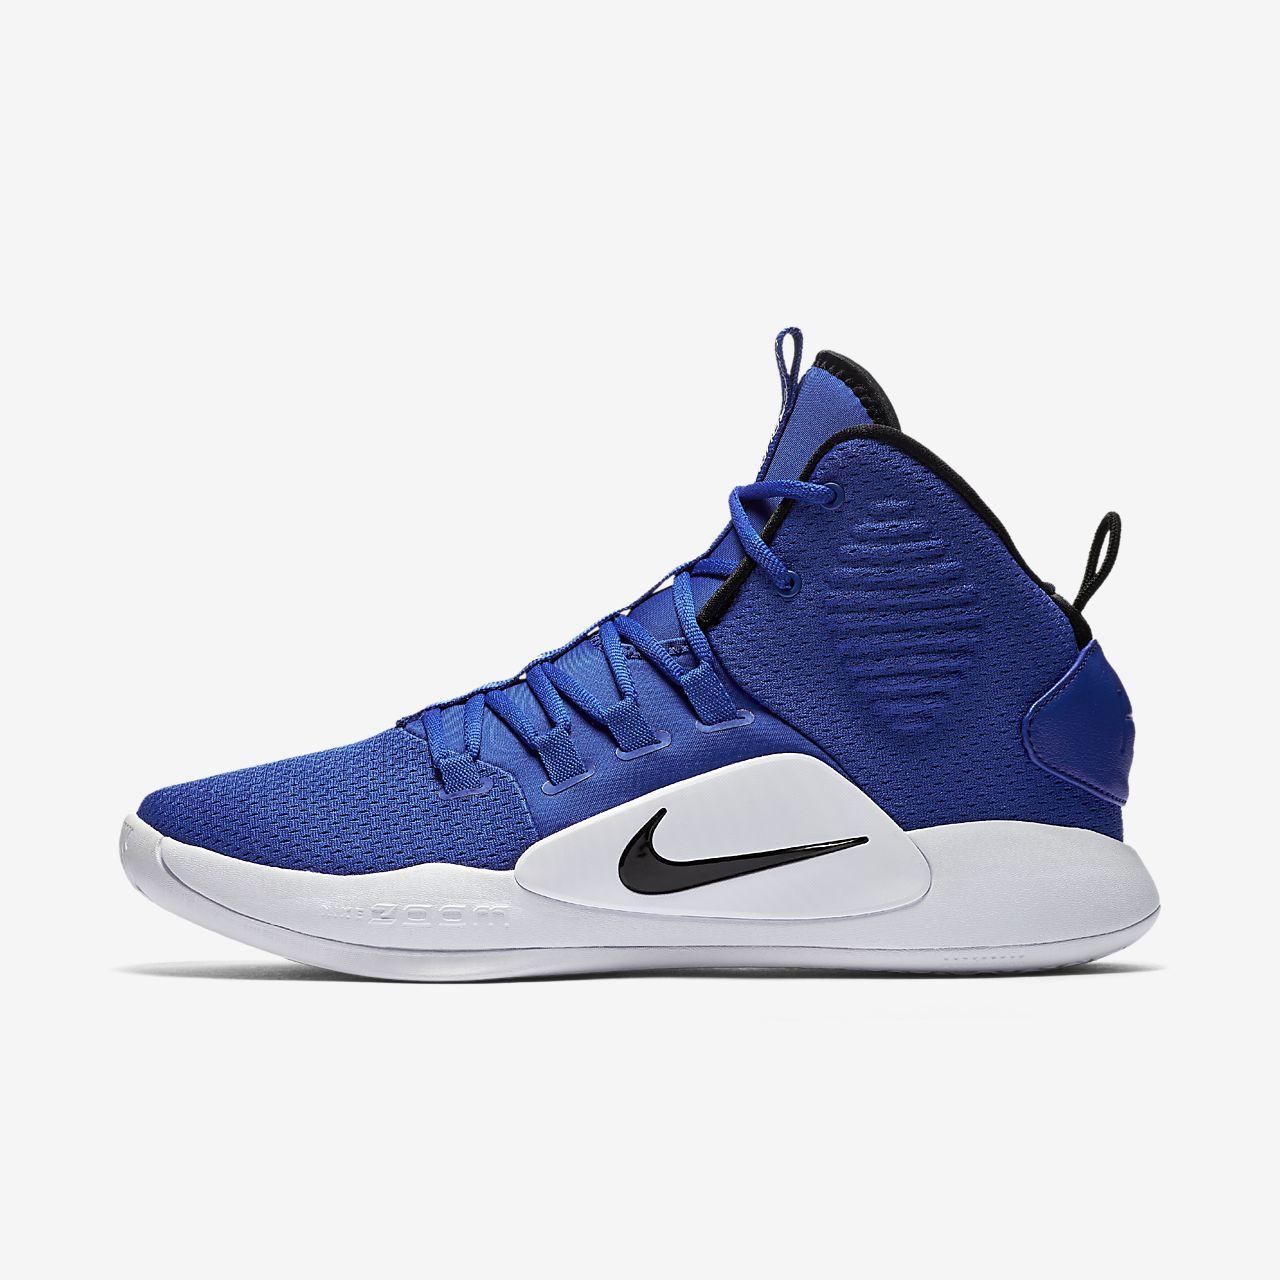 b1a3ae57065c Nike Hyperdunk X TB Basketball Shoe. Nike.com